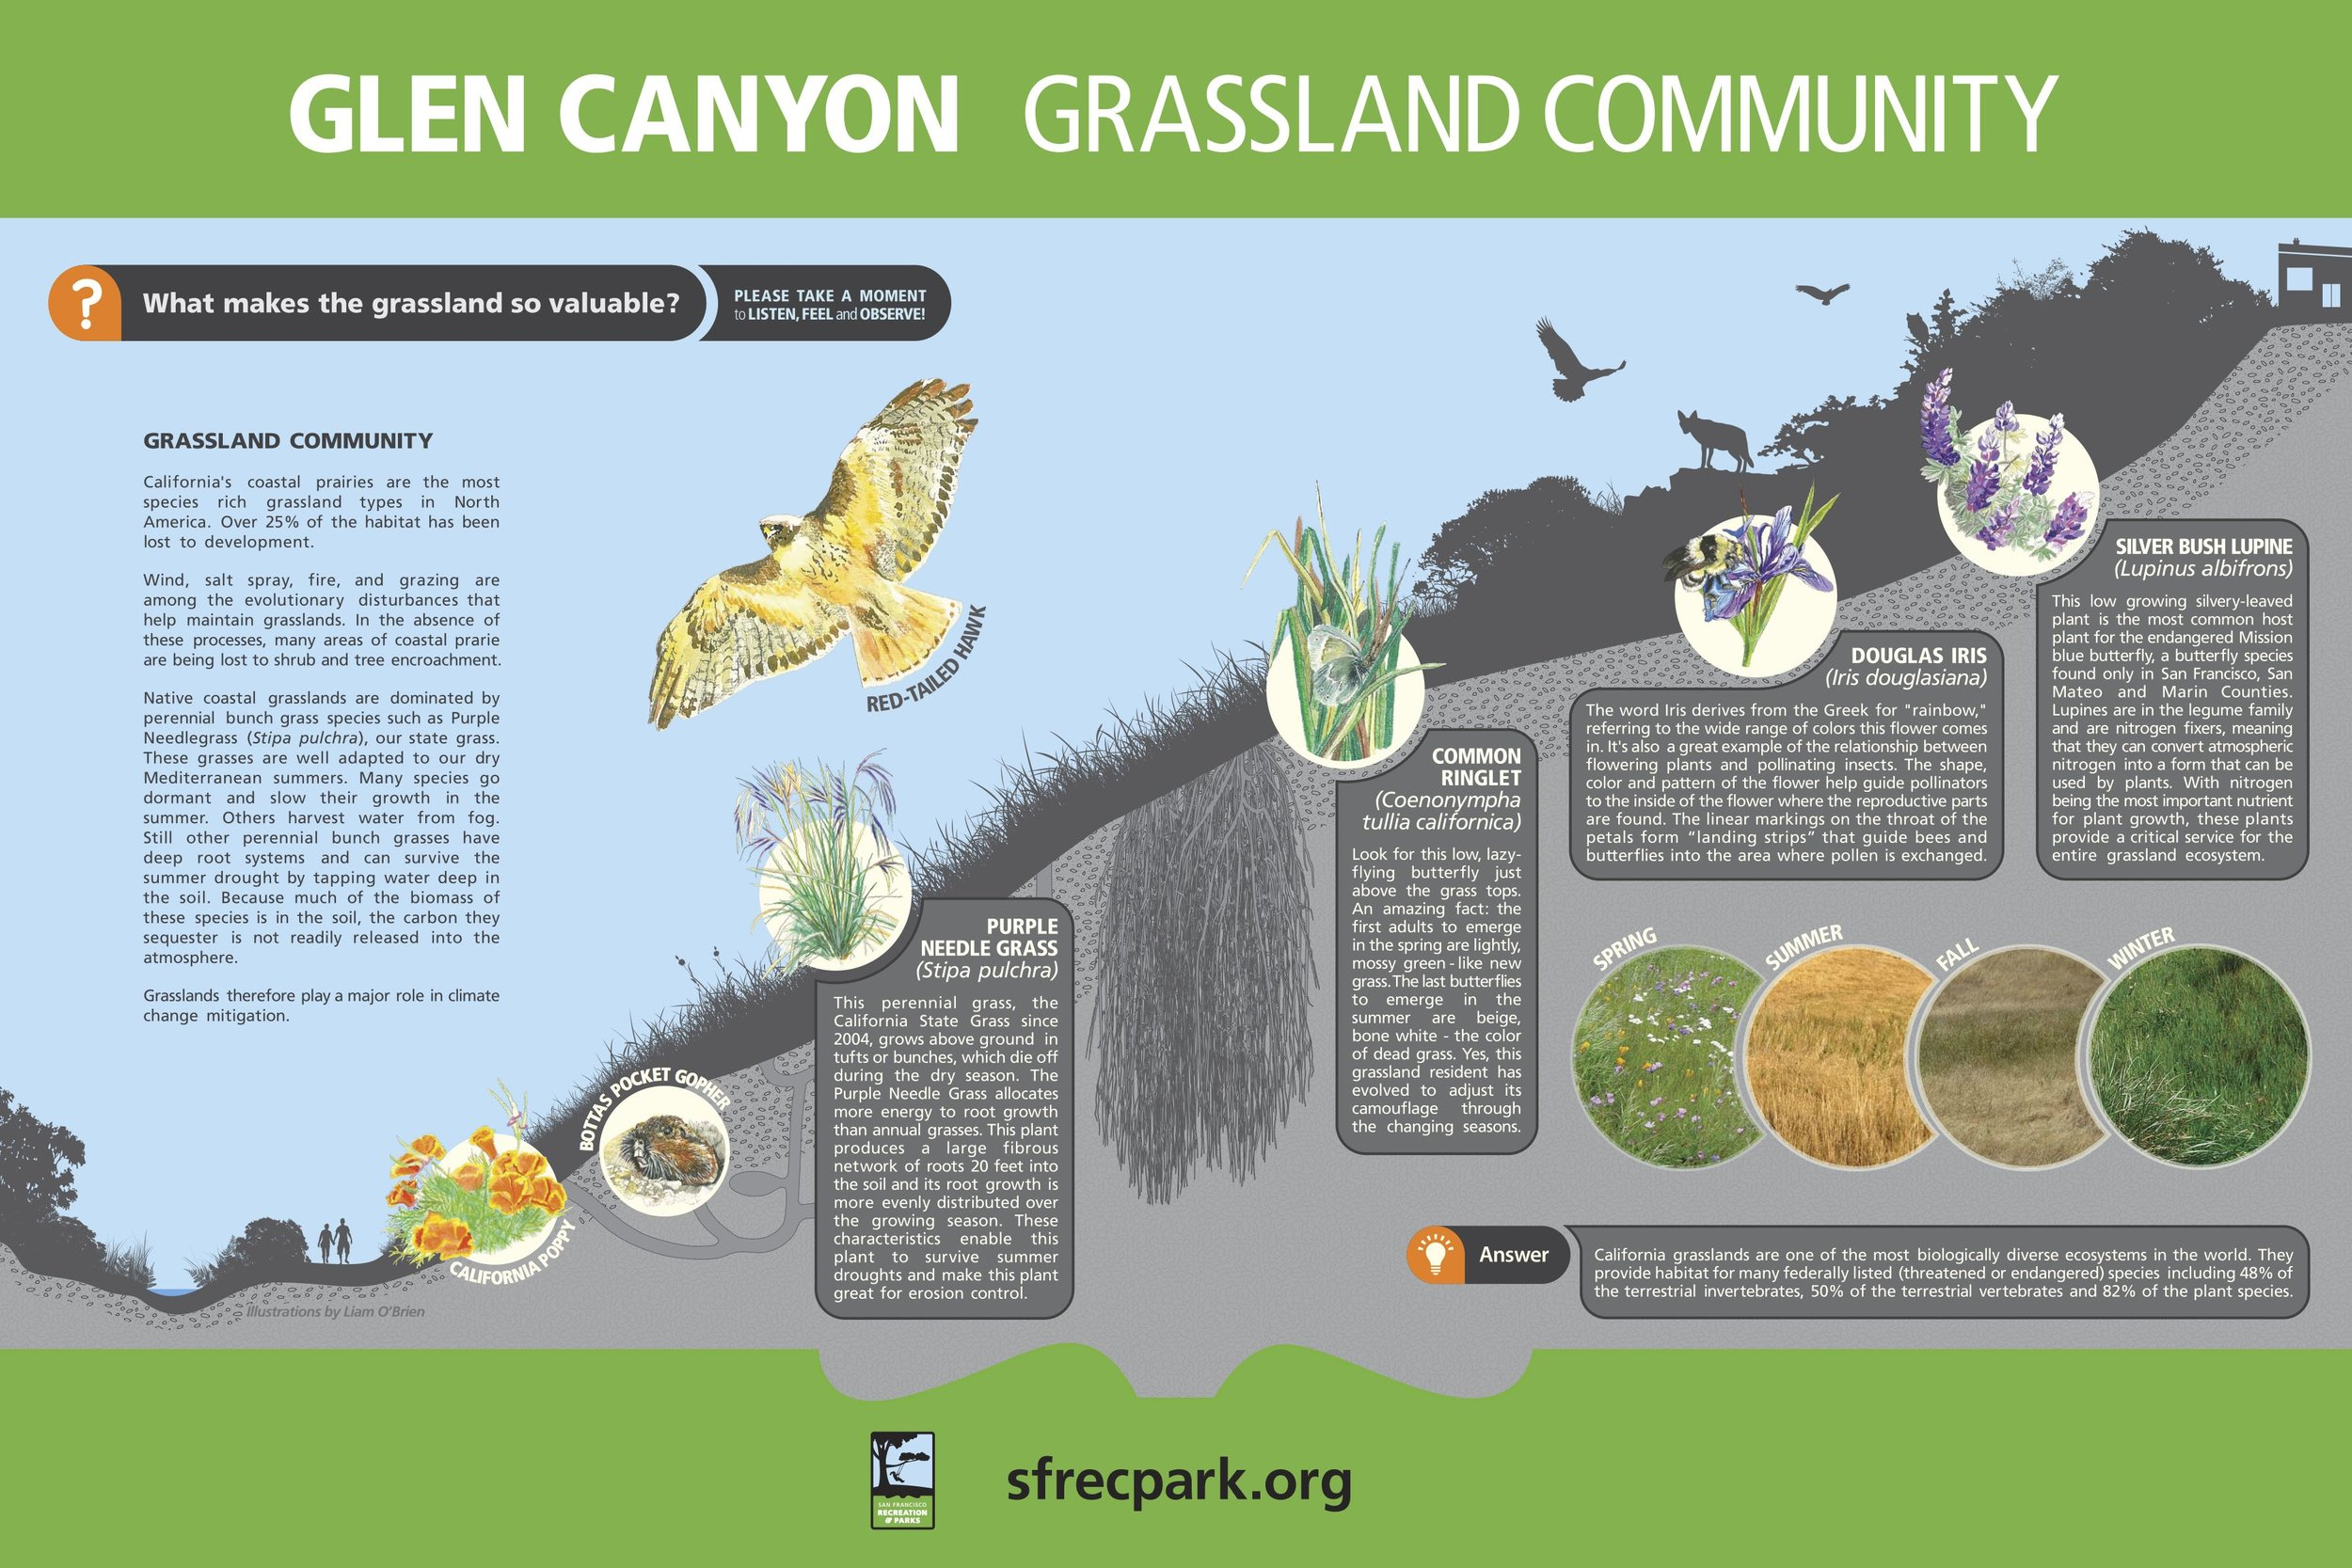 InkeDesign-Glen-Canyon-Park-Interpretive-3Grasslands.jpg